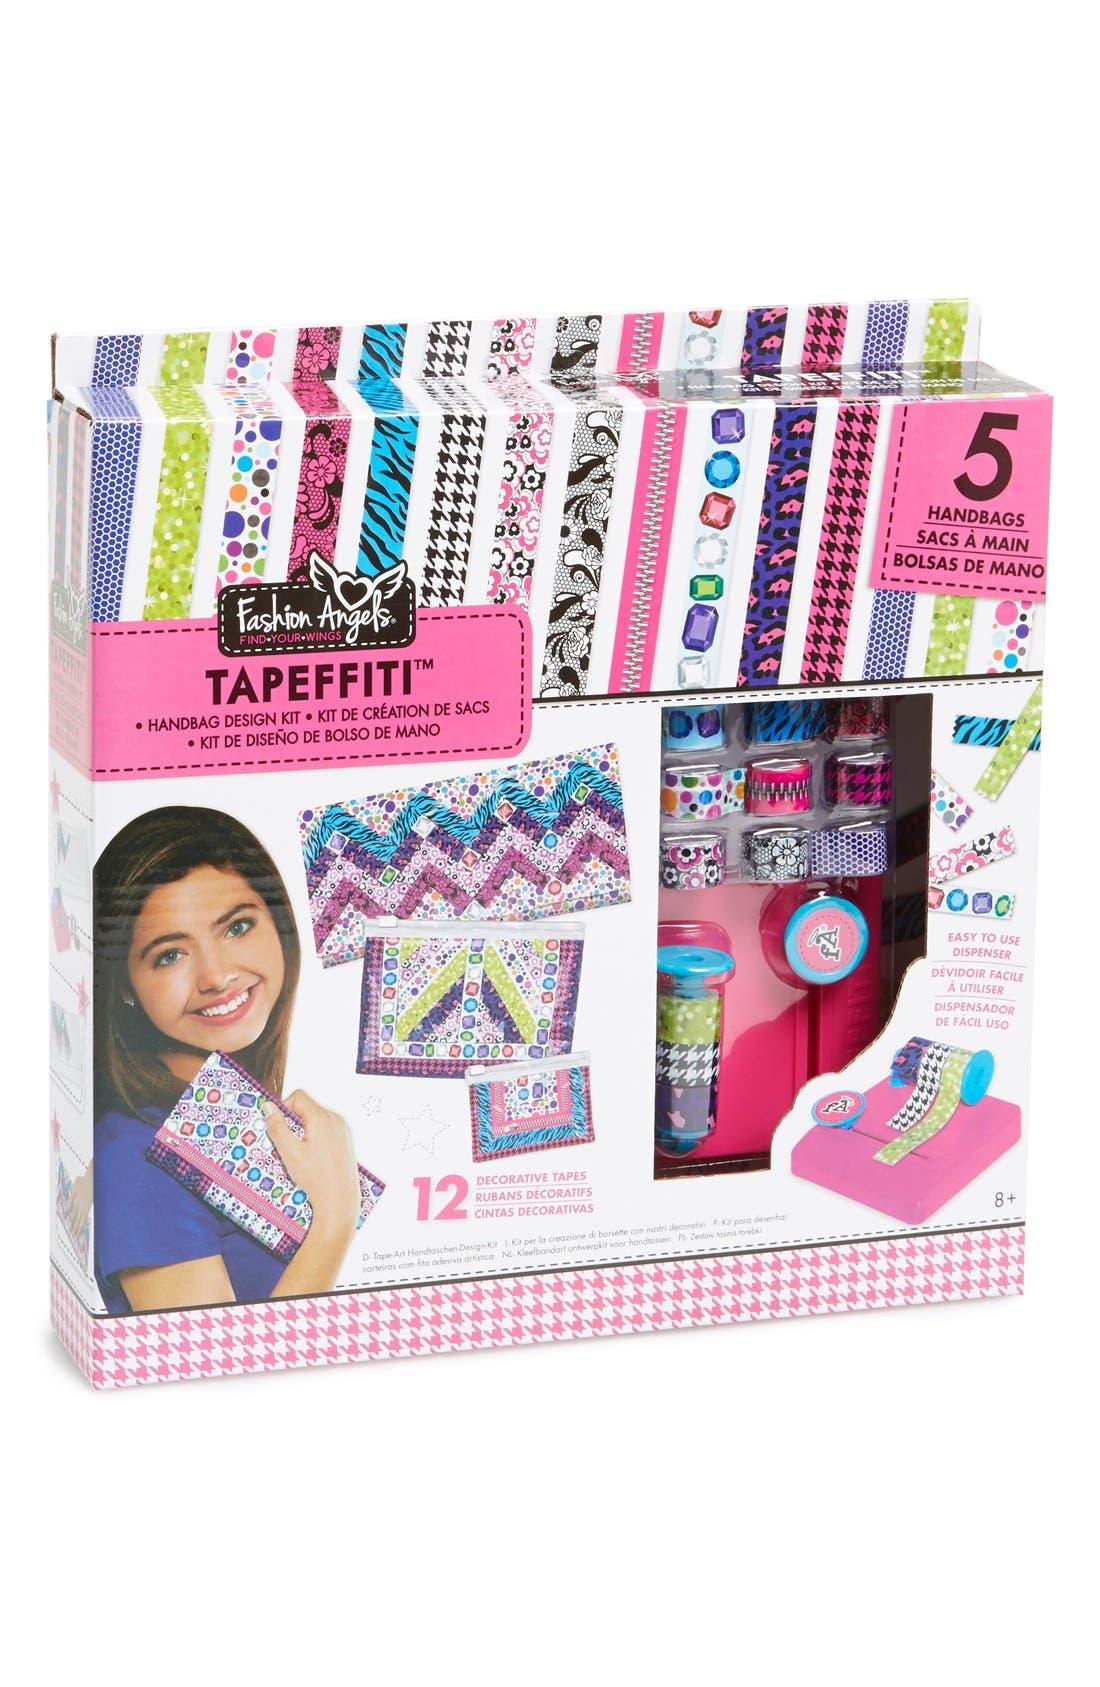 Main Image - Fashion Angels 'Tapefetti™' Handbag Kit